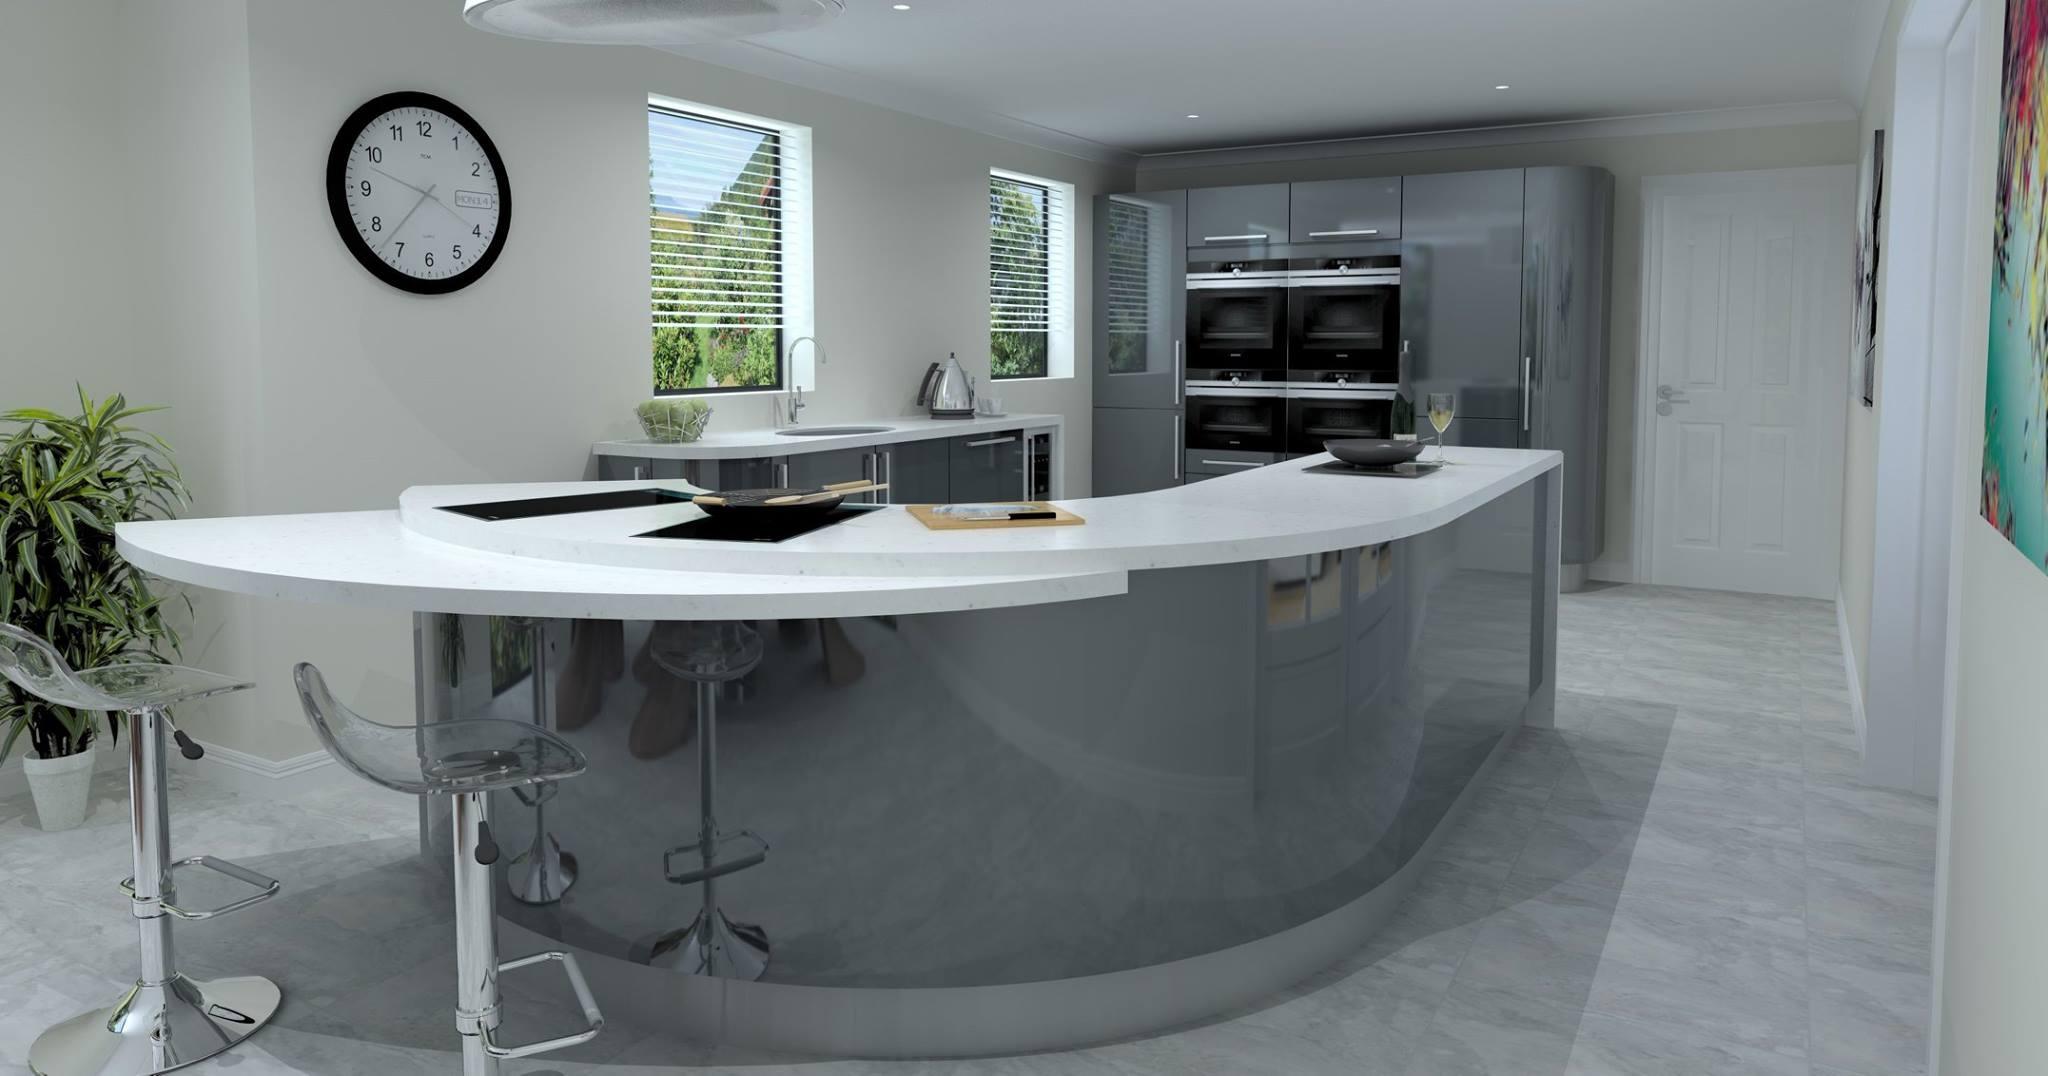 Ceredigion Plumbing Supplies | Bathrooms | Heating | Kitchens ...